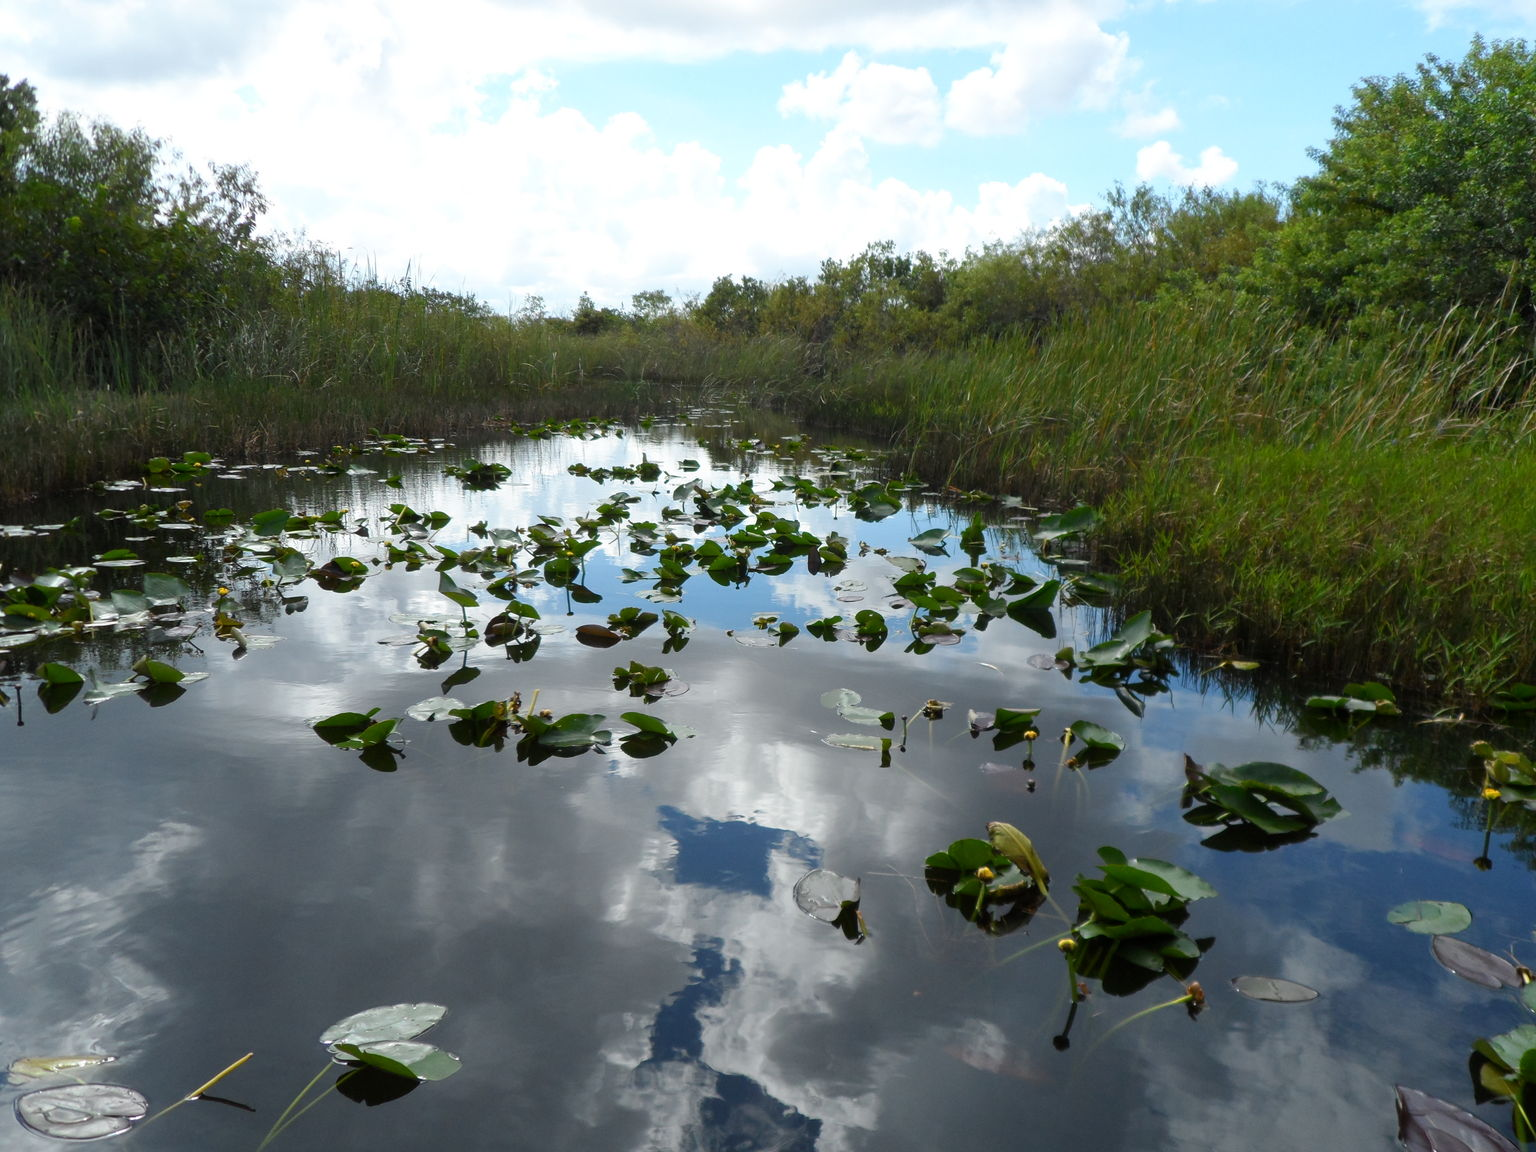 MORE PHOTOS, Miami Super Saver: Everglades Airboat Adventure and Miami City Tour